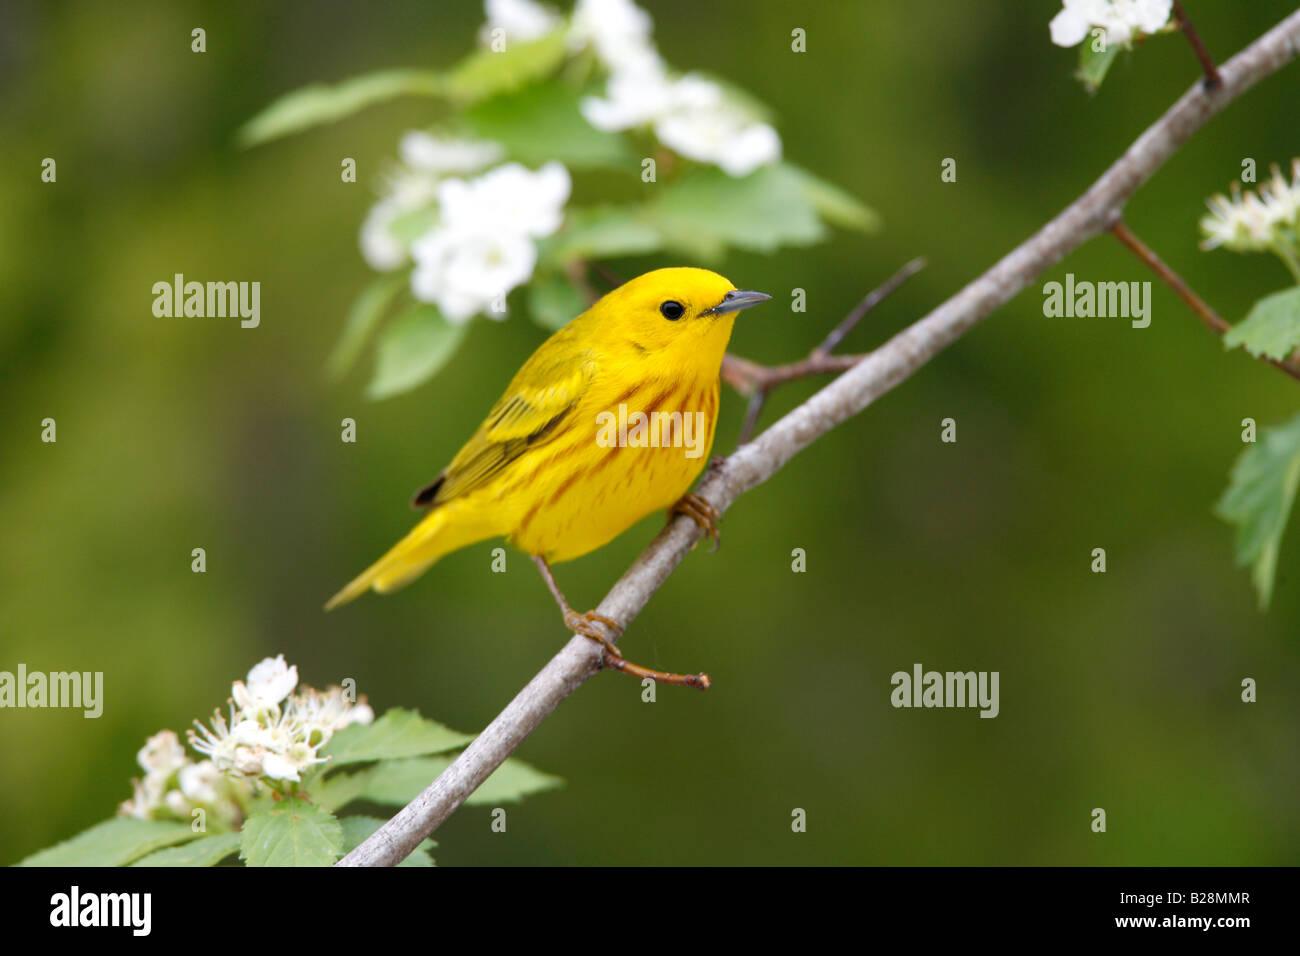 Yellow Warbler in Hawthorn Tree - Stock Image